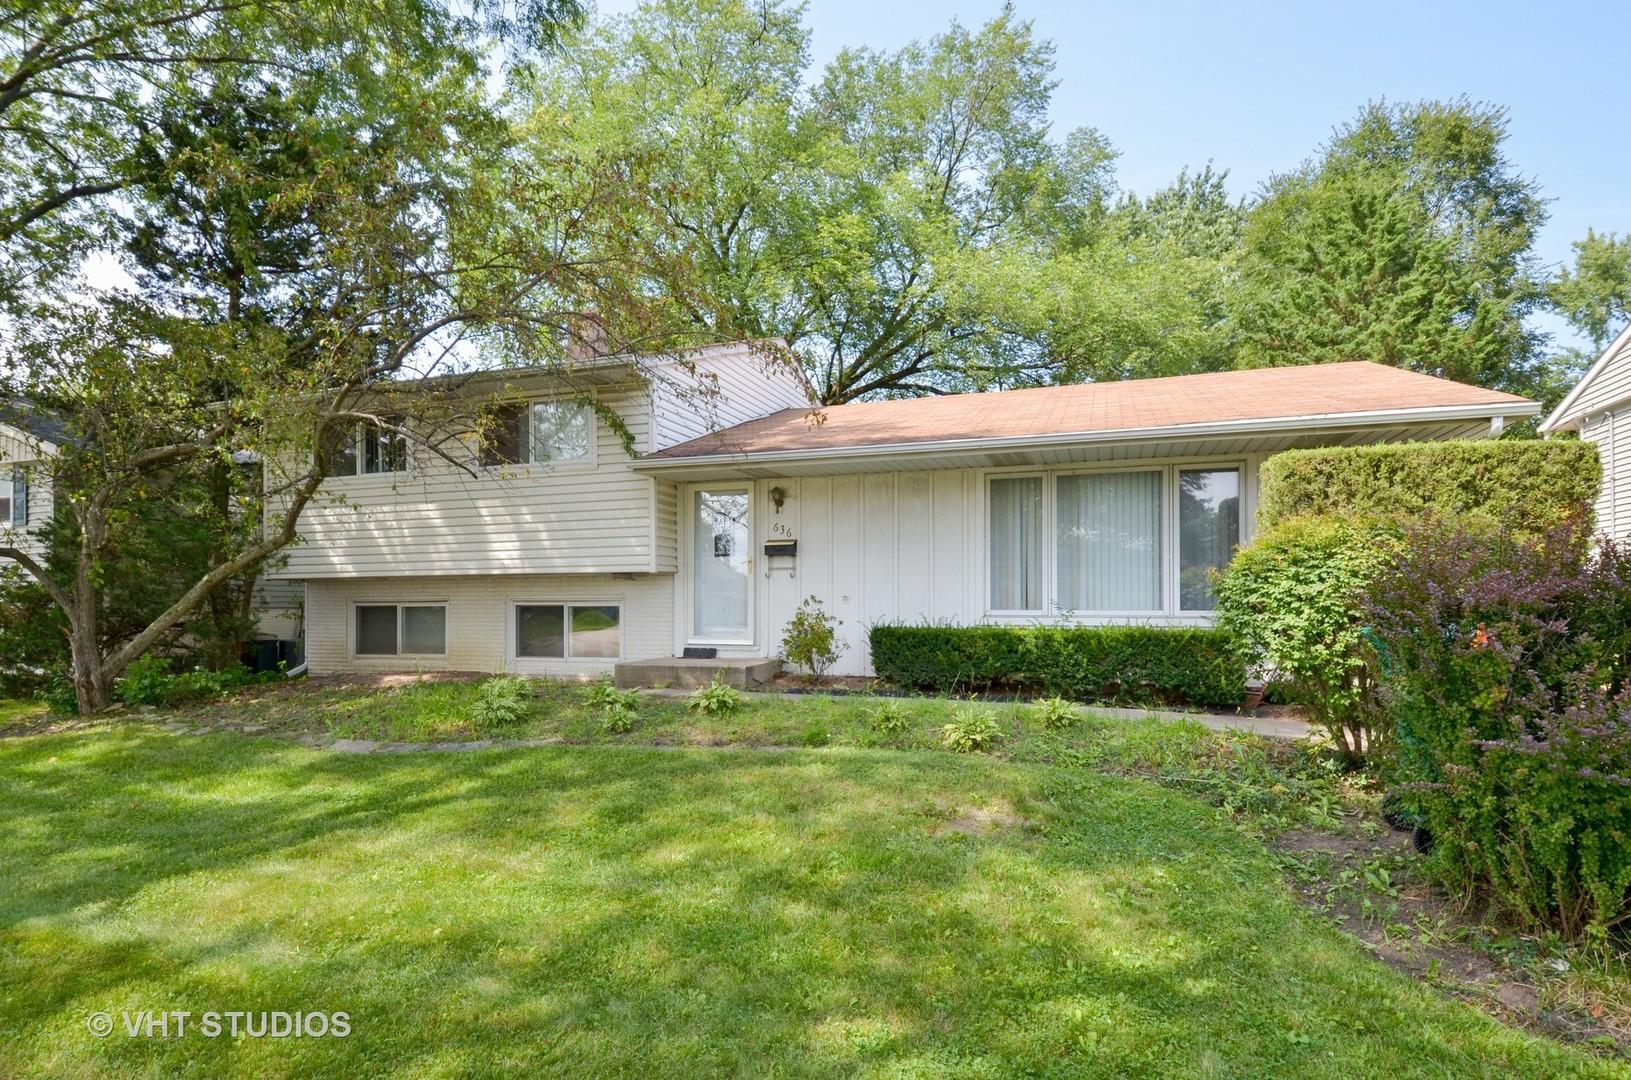 636 Hawthorne Rd, Buffalo Grove IL 60089